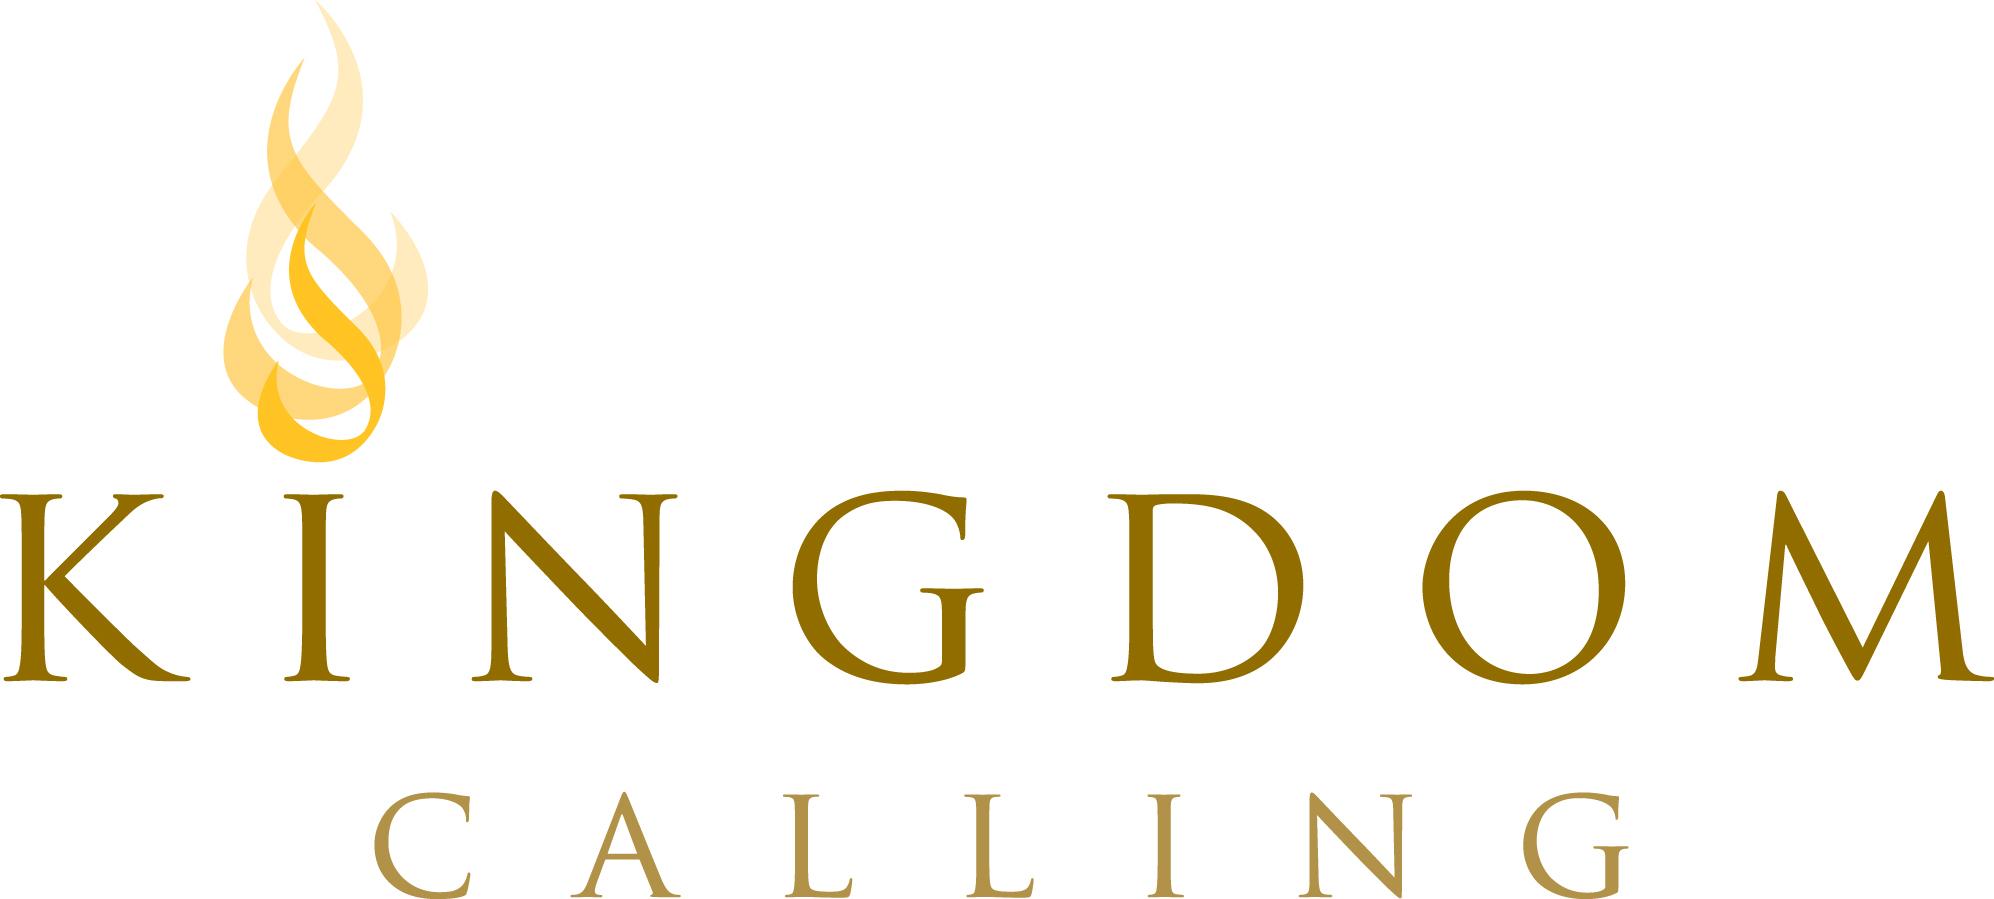 Kingdom Calling